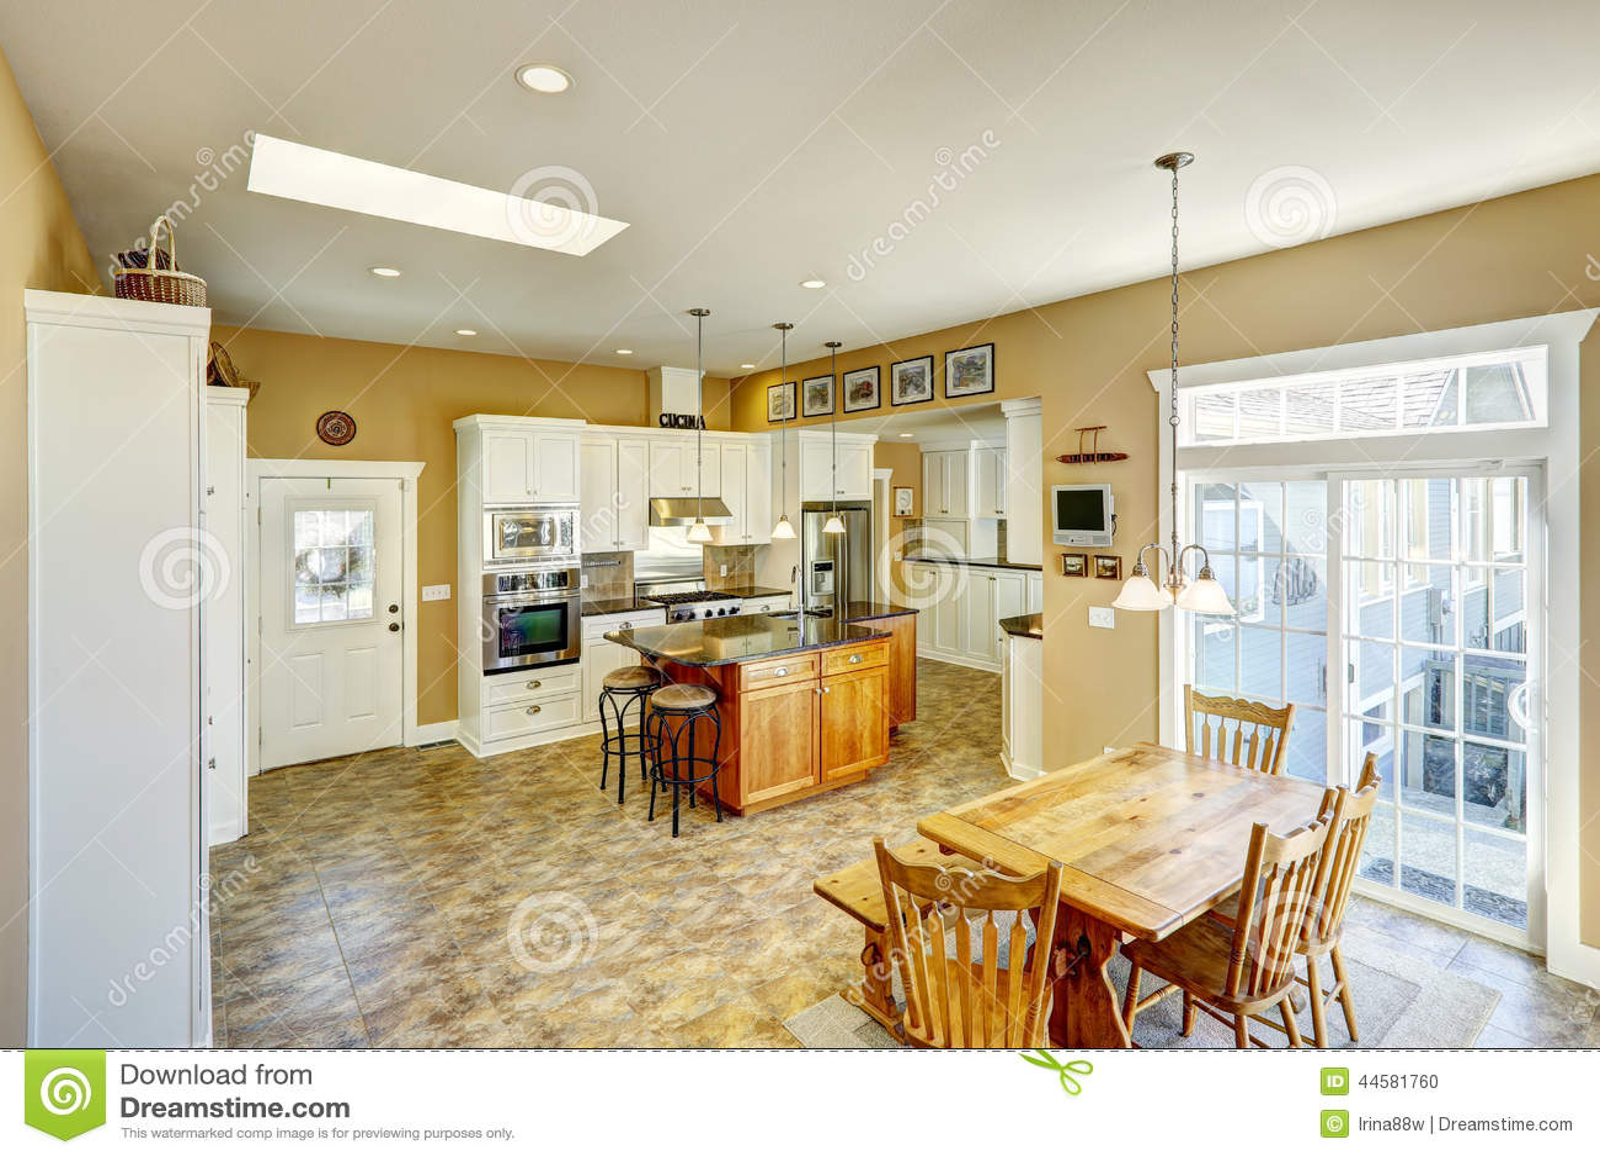 Cuisine avec salle a manger integree maison design - Petite cuisine integree ...